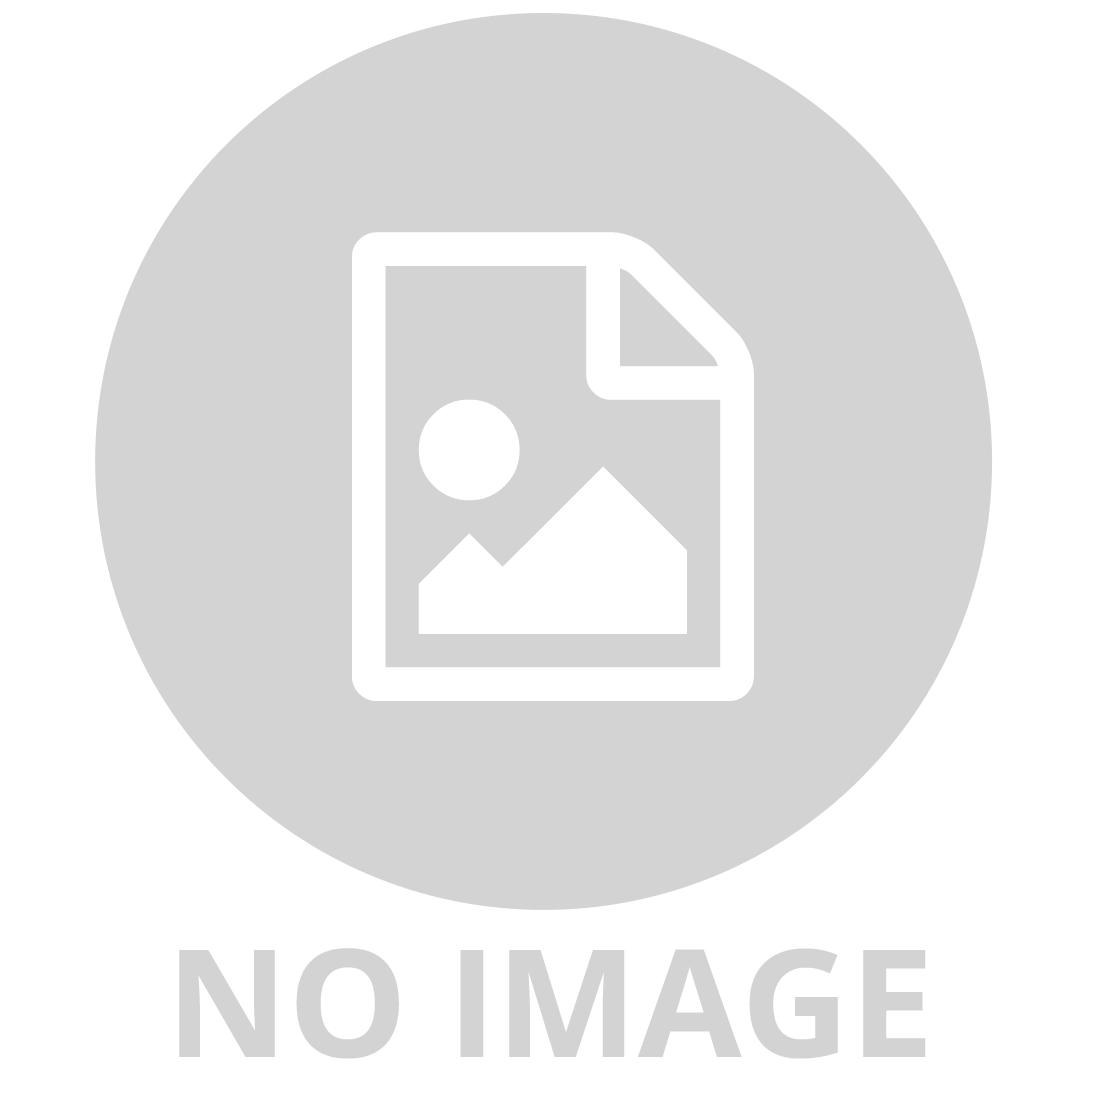 TAMIYA TS 74 CLEAR RED SPRAY PAINT FOR PLASTICS